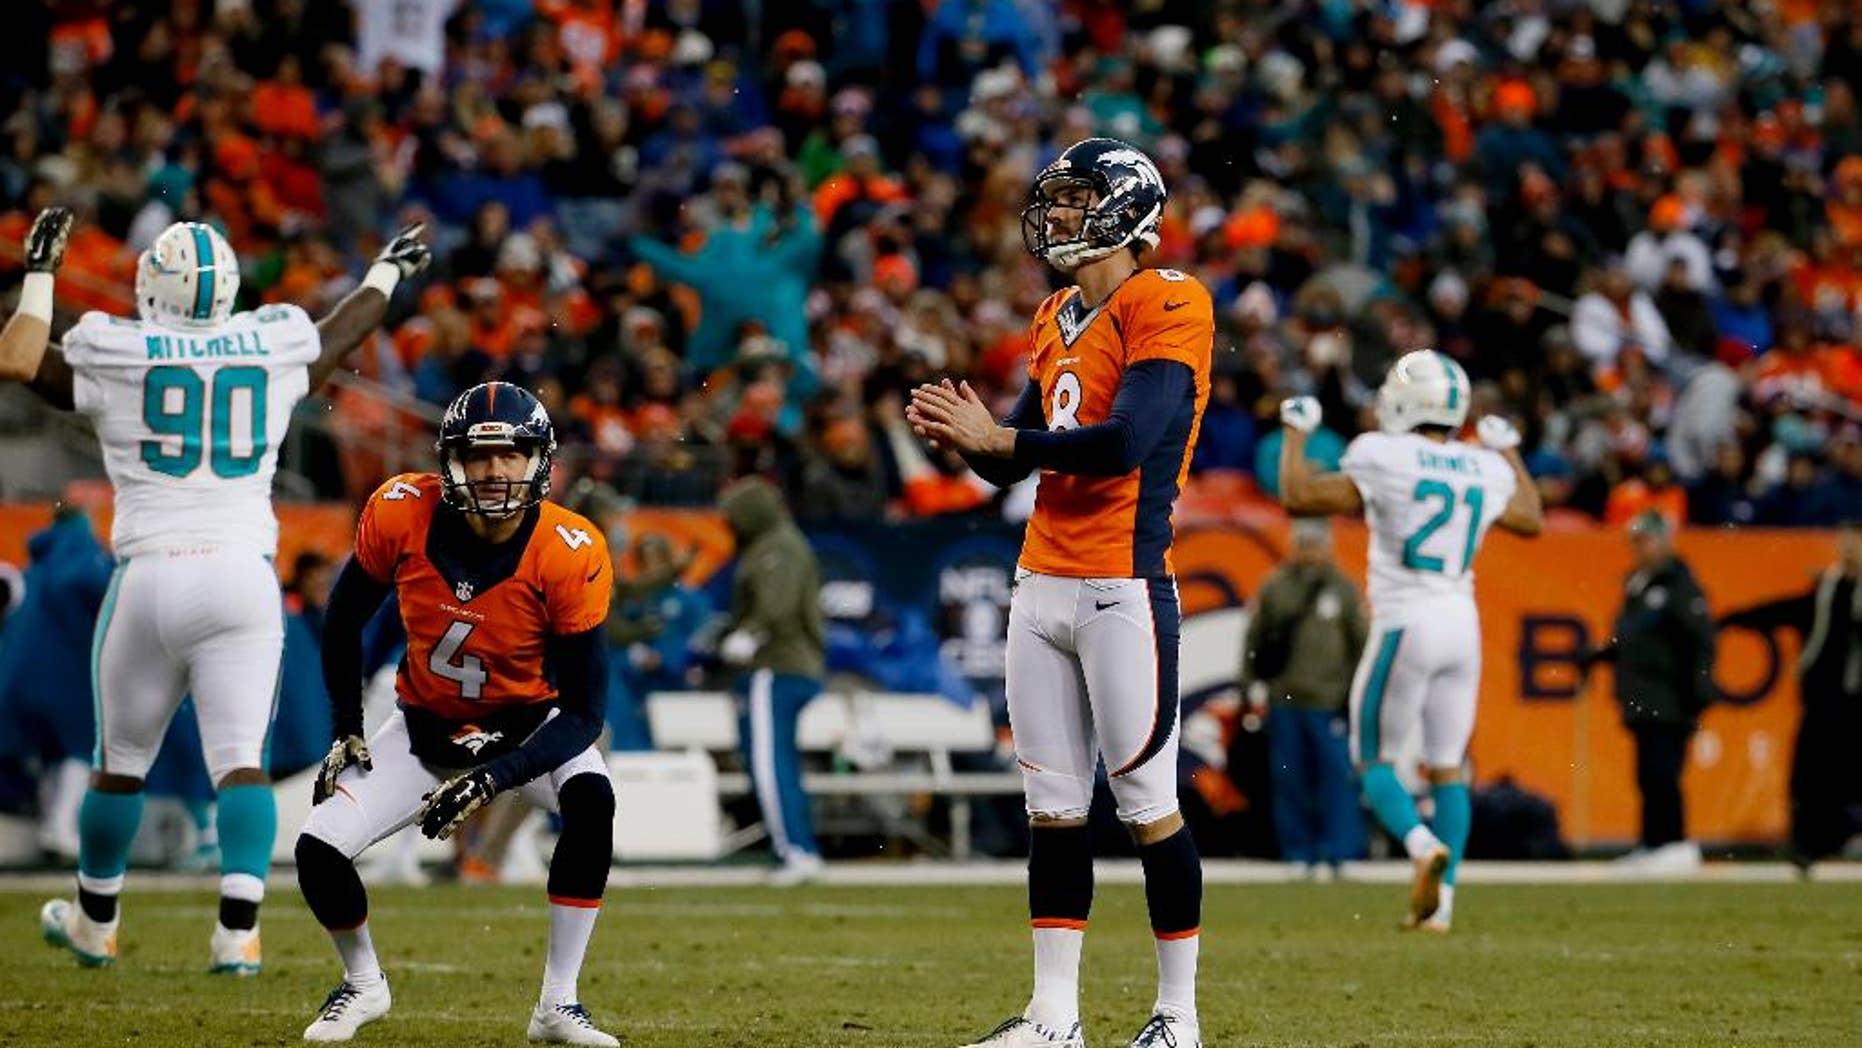 Miami Dolphins quarterback Ryan Tannehill (17) warms up prior to an NFL football game against the Denver Broncos, Sunday, Nov. 23, 2014, in Denver. (AP Photo/Joe Mahoney)